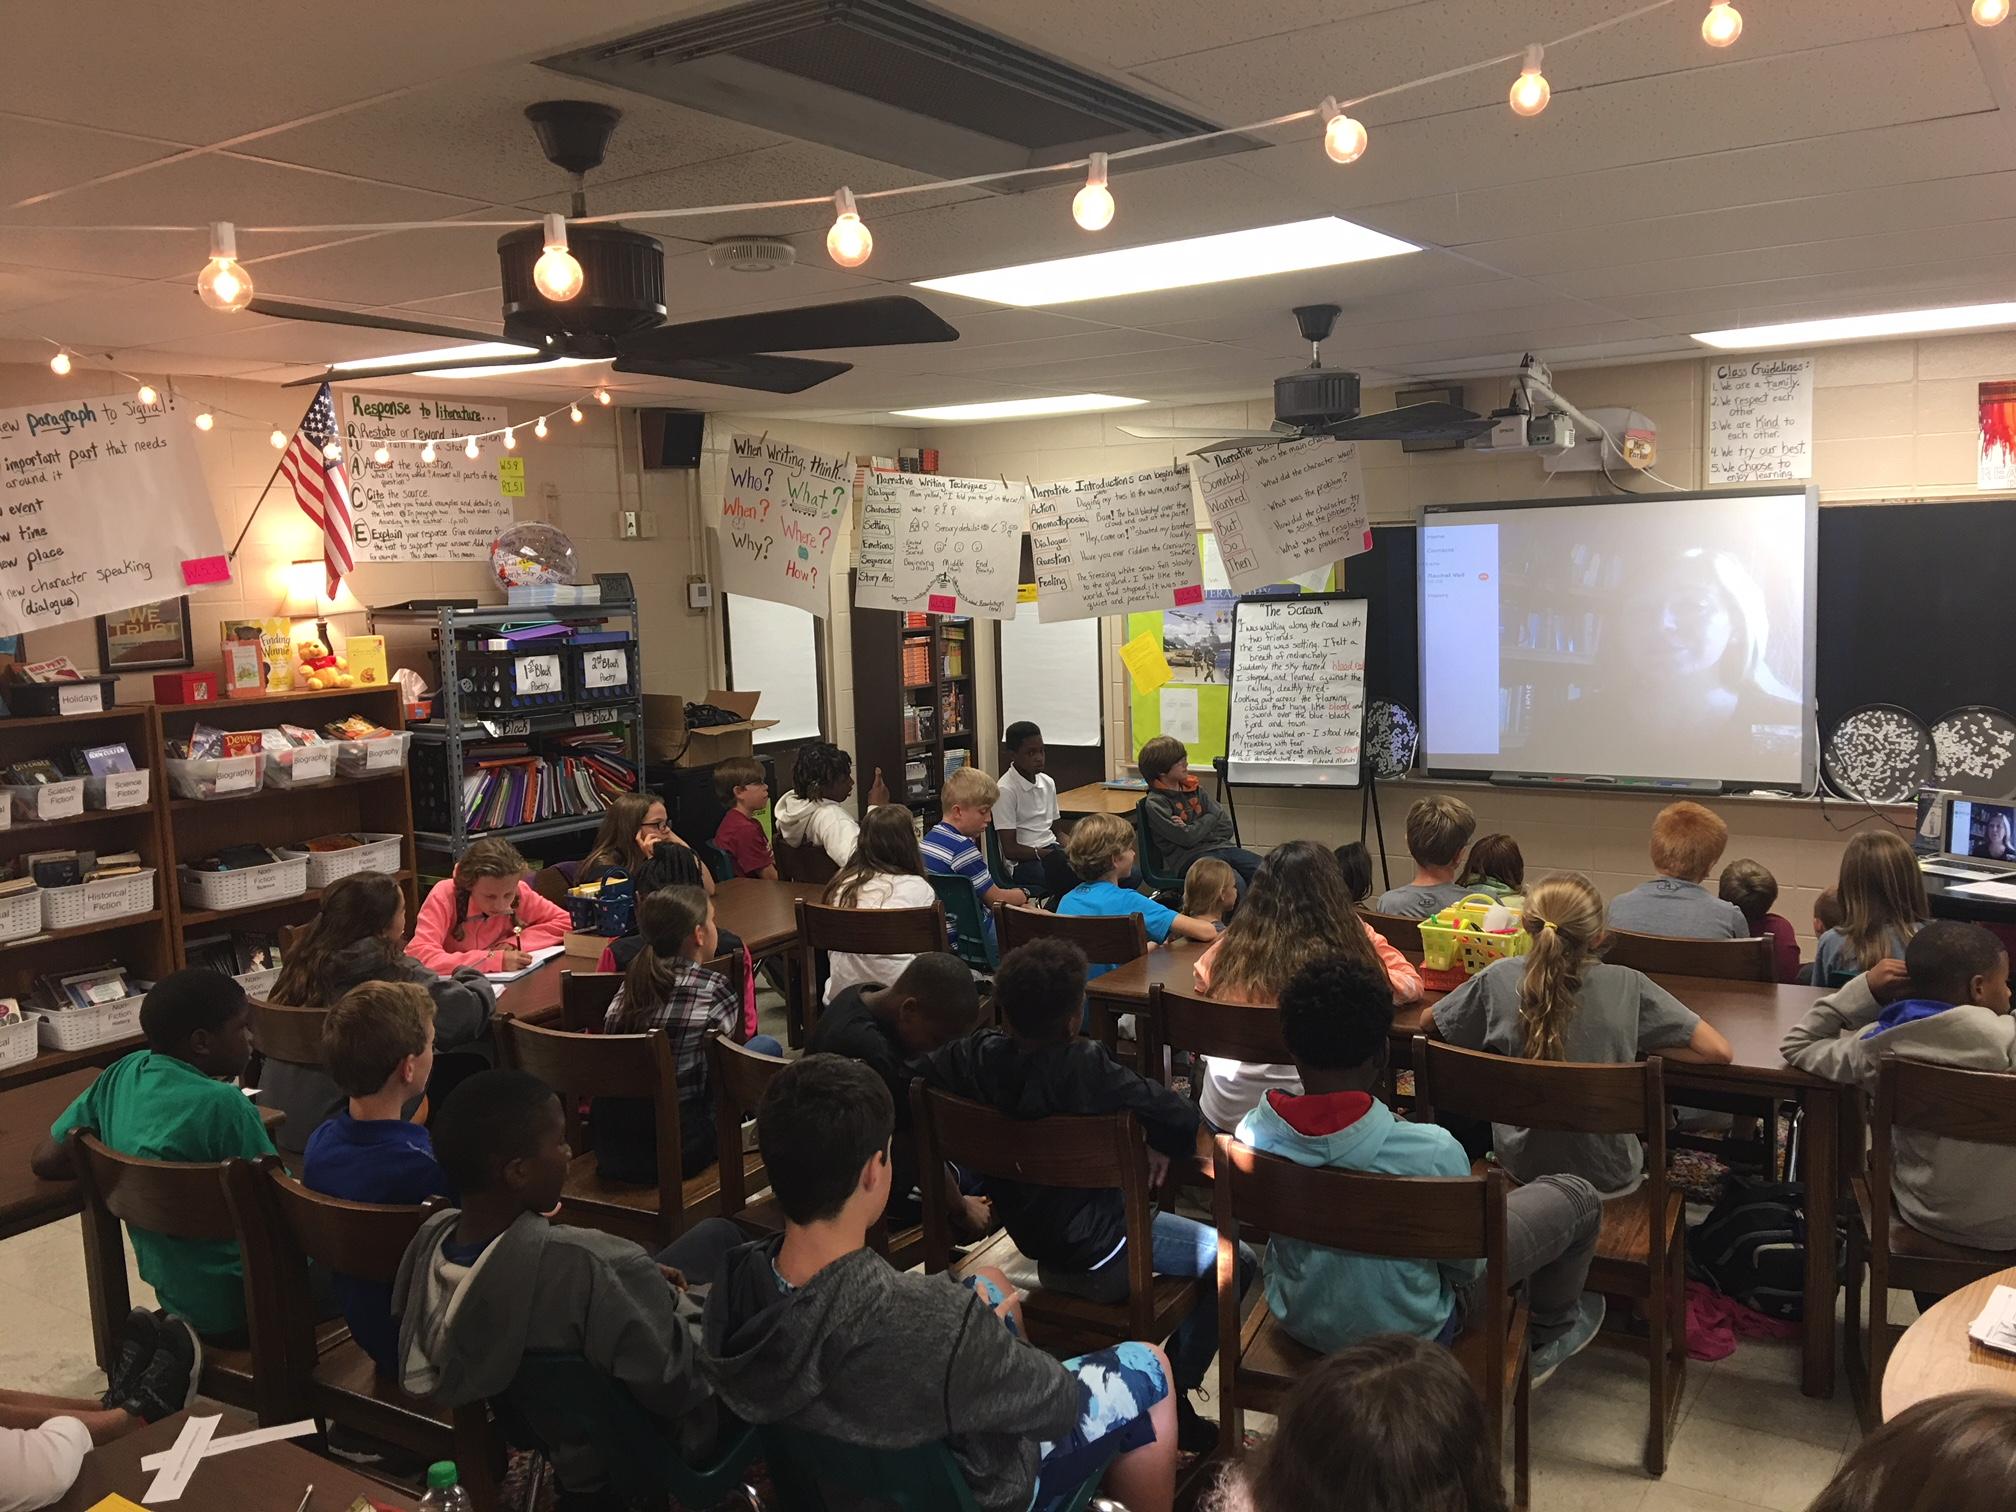 Such a fun Skype visit with Puckett Elementary School in Puckett, MS!